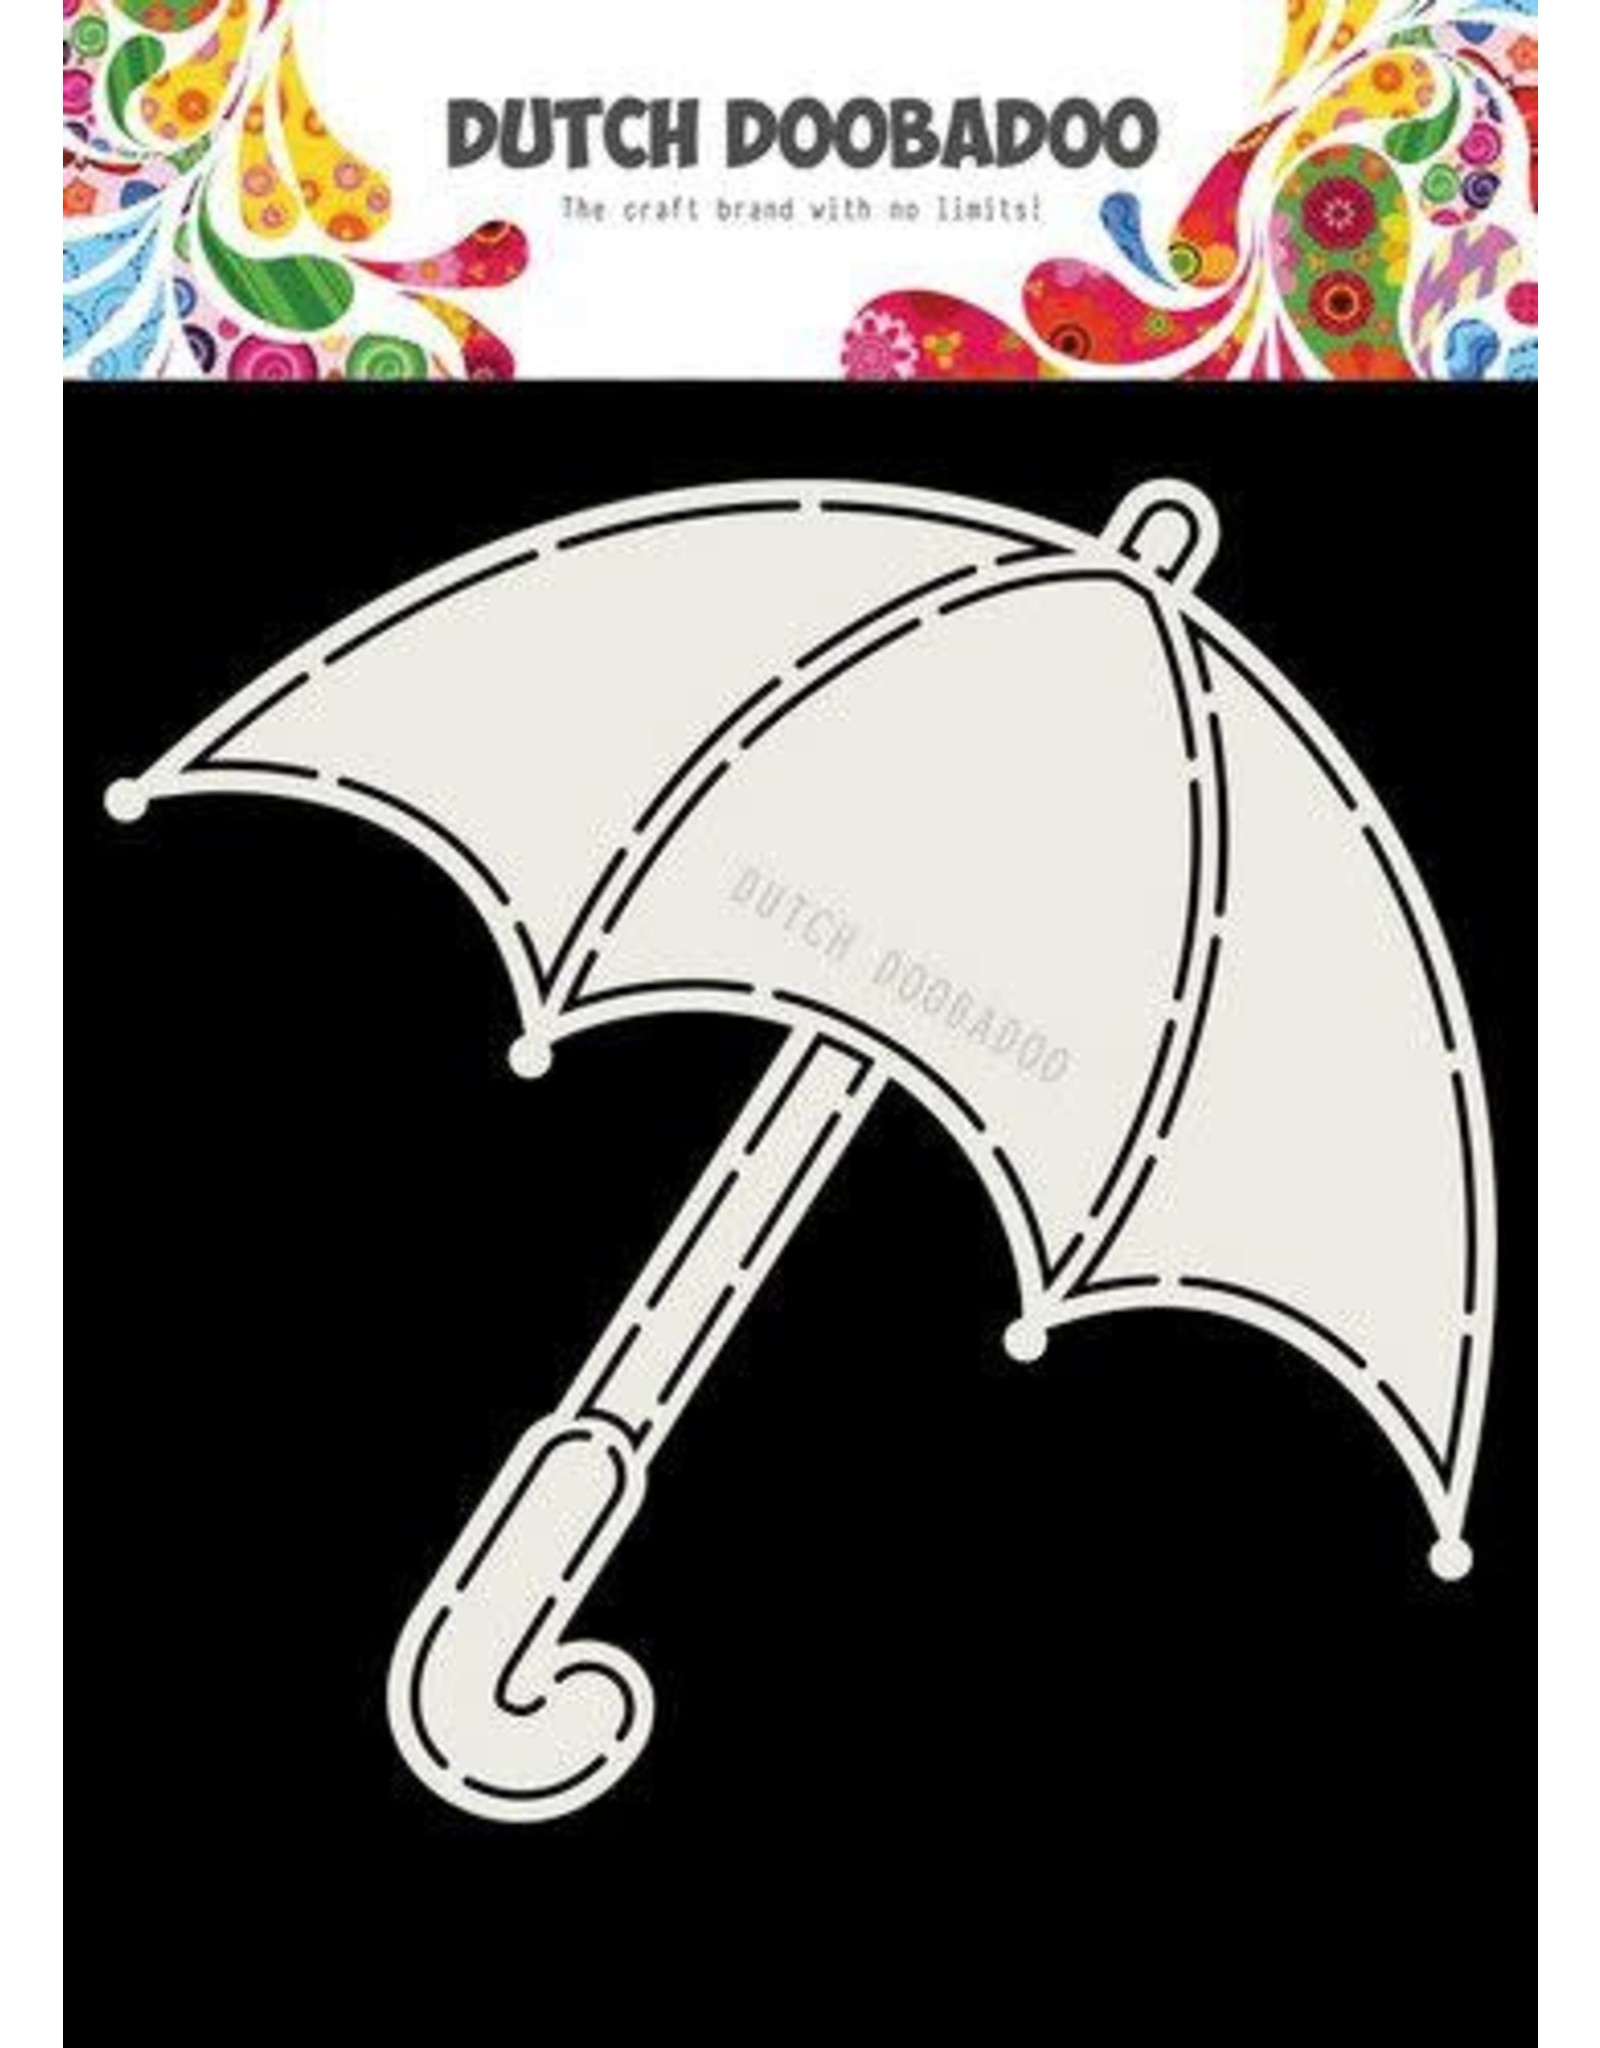 Dutch Doobadoo Dutch Doobadoo Card Art Paraplu A5 470.713.742